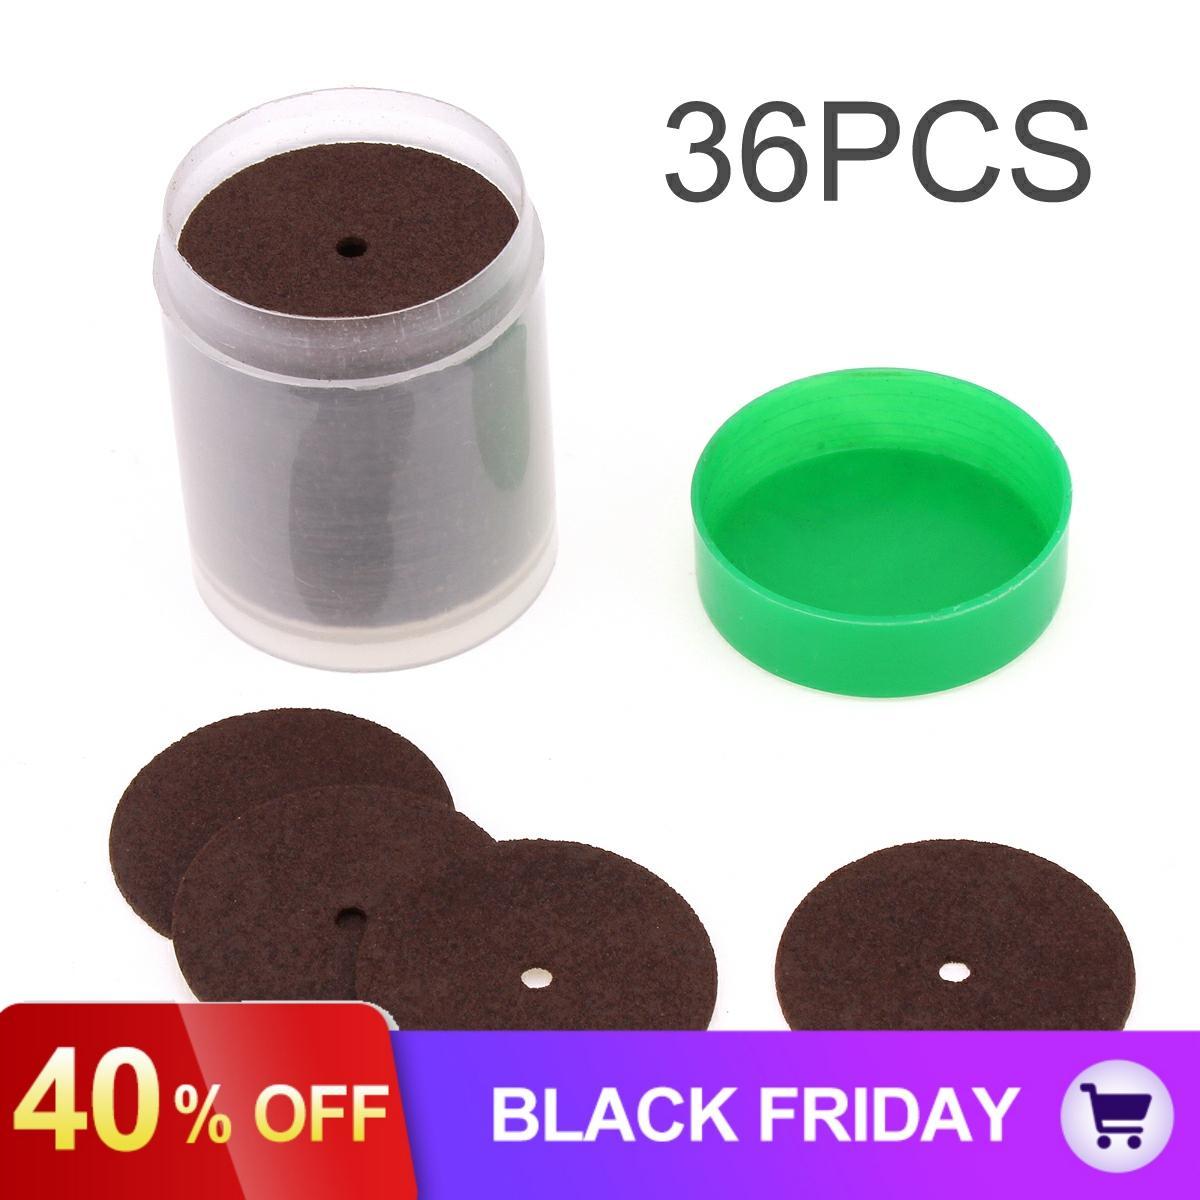 36pcs Resin Cutting Wheel Disc Abrasive Sand Cut-off Wheels For Dremel Rotary Tool